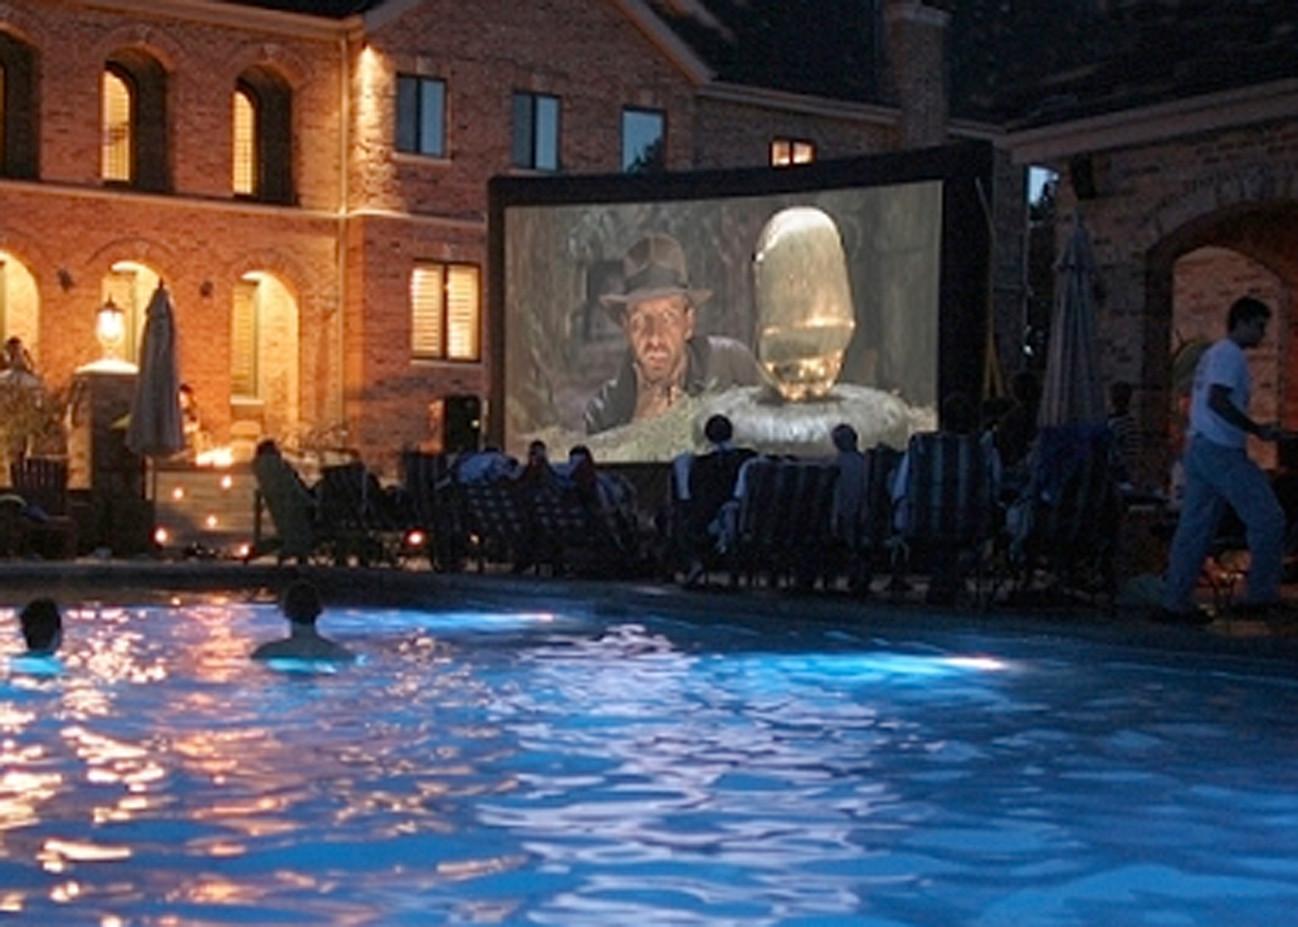 Inflatable-Movie-Screen-Movie-Night.jpg